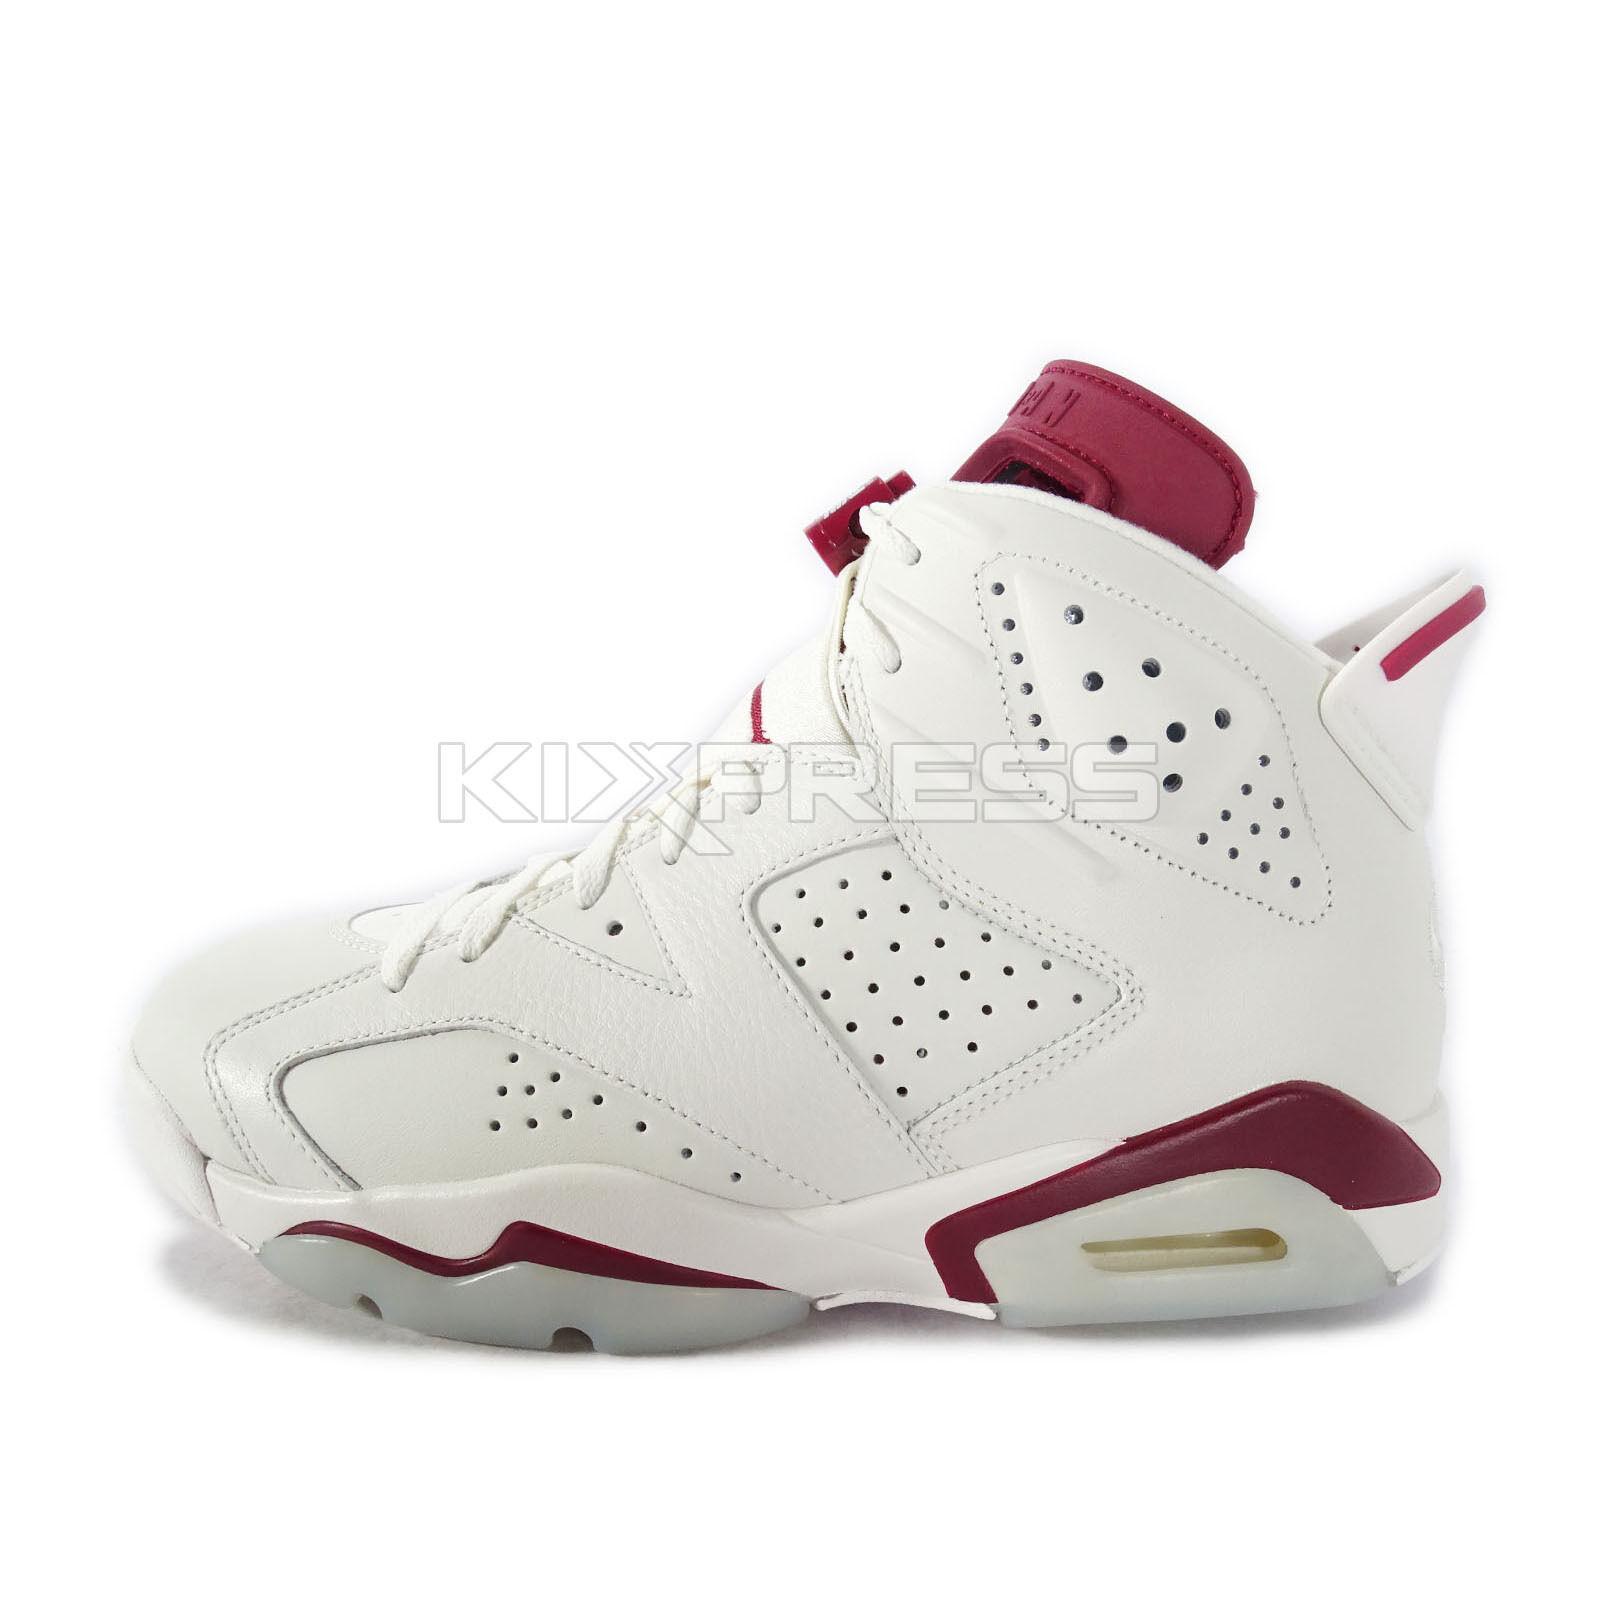 Nike Air Jordan 6 VI Retro Mahroon 2015 White 384664-116 Size 10